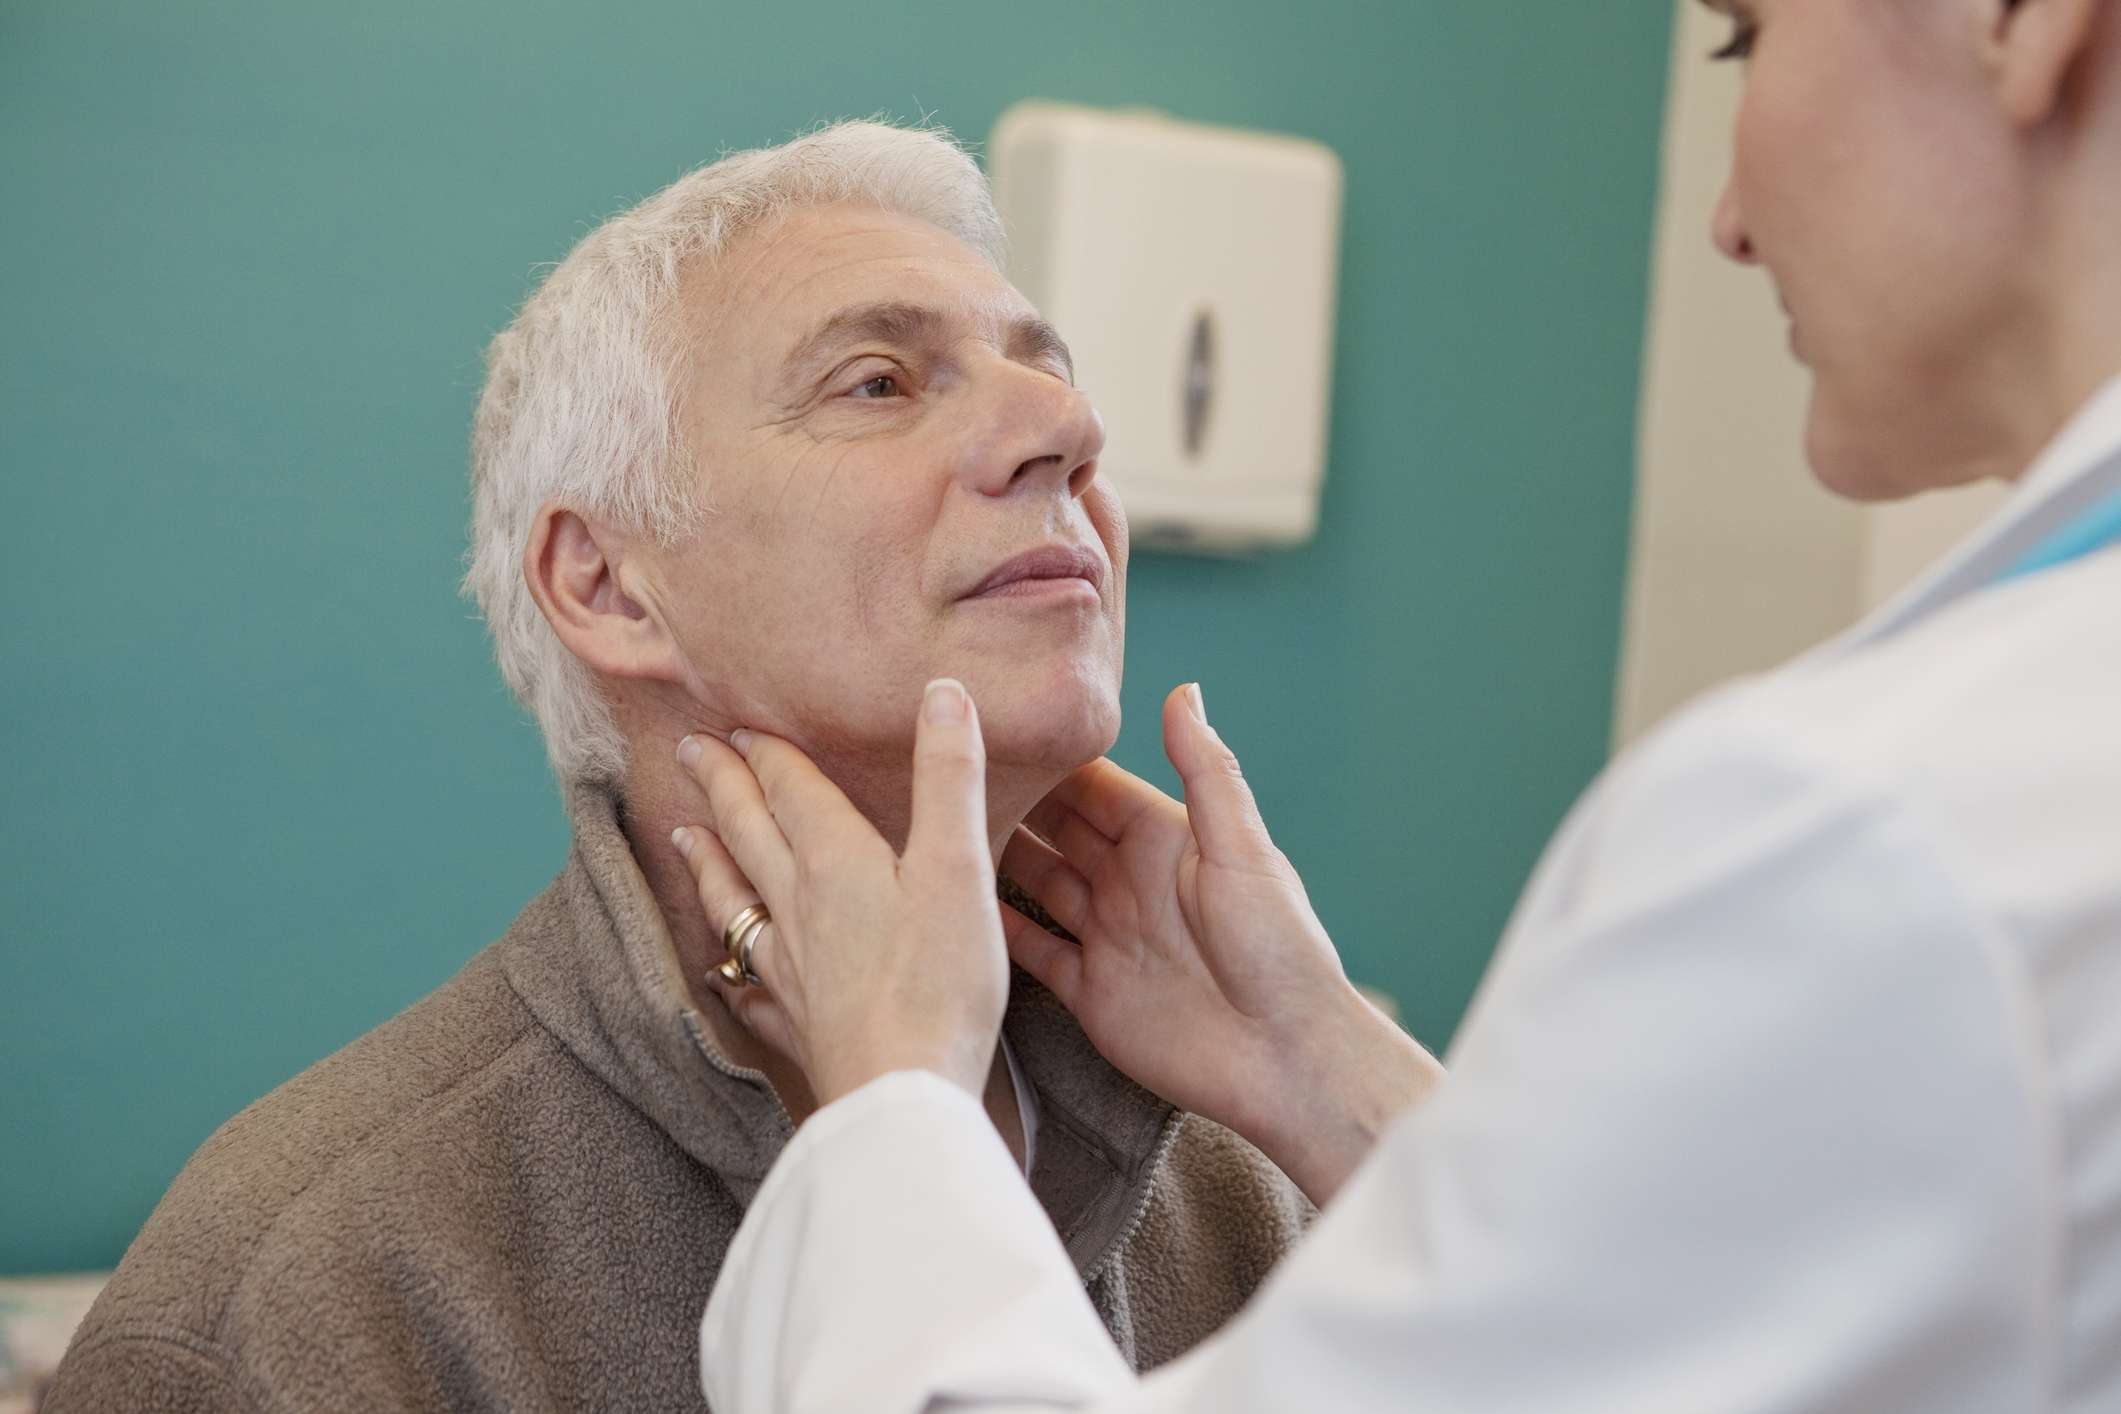 Doctor feeling elderly man's lymph nodes